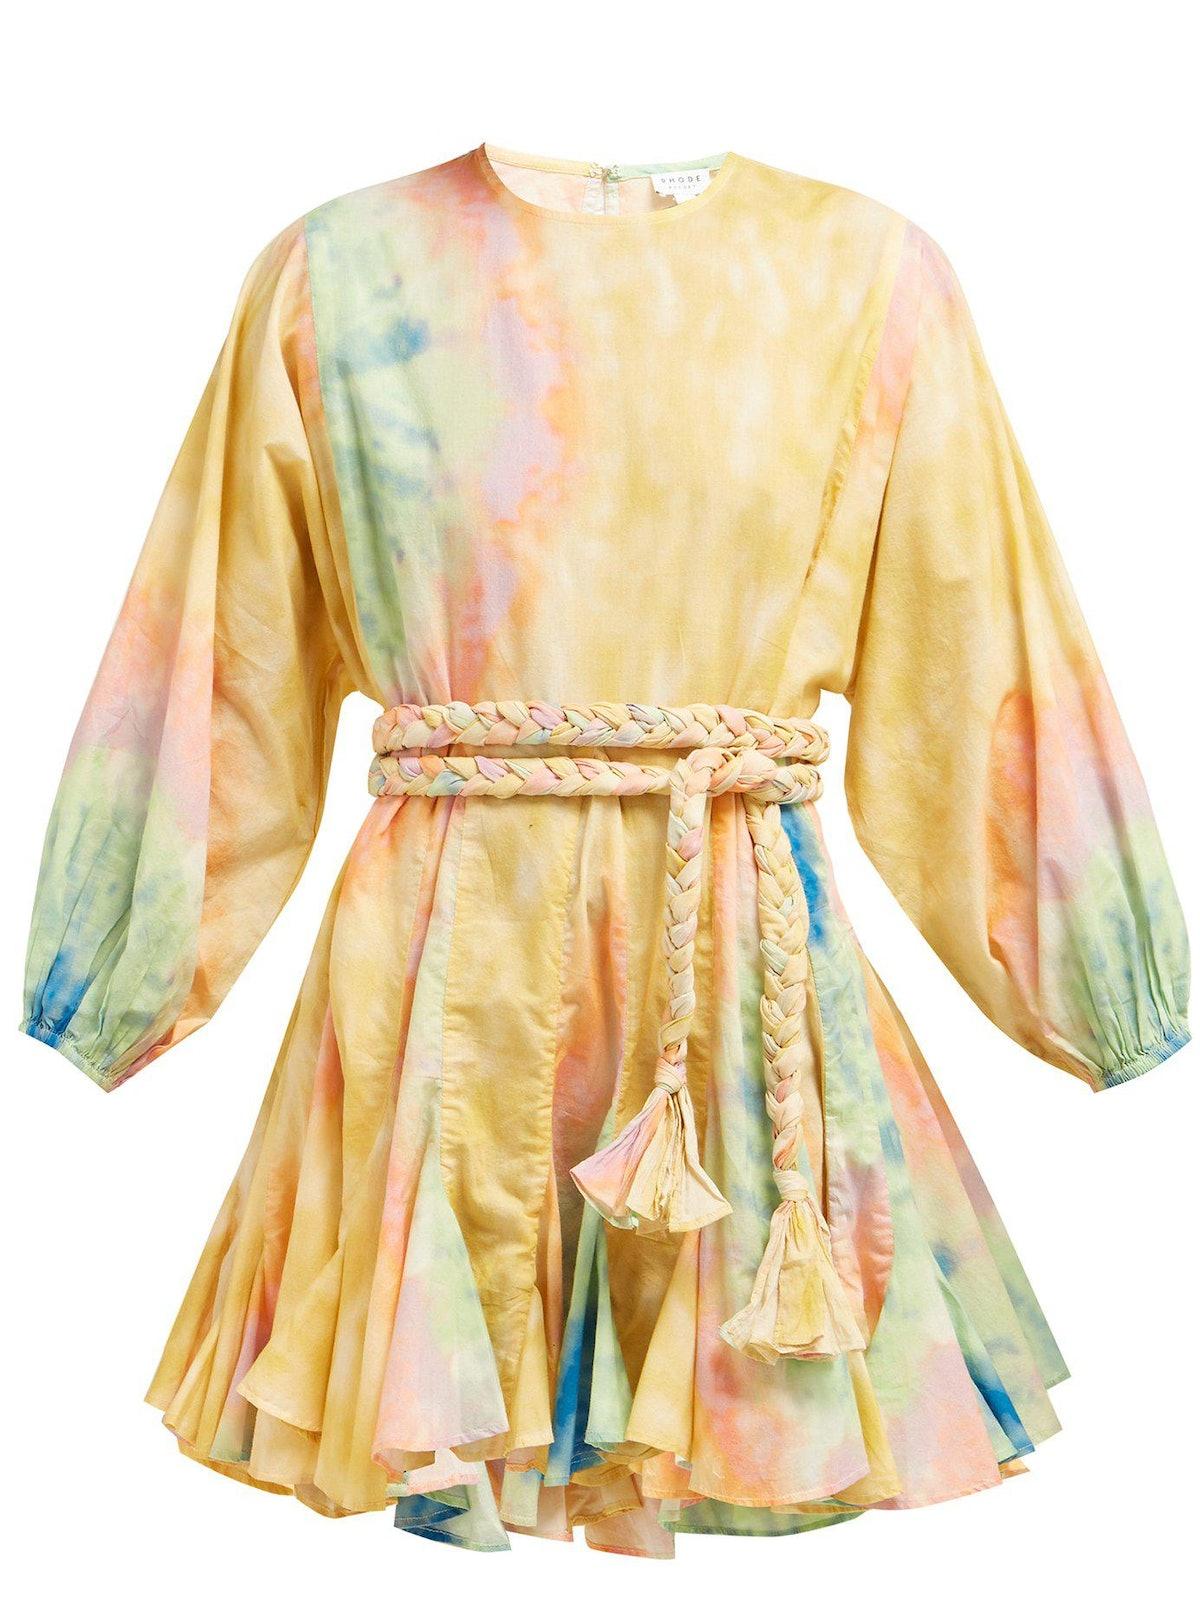 Ella Tie Dye Dress